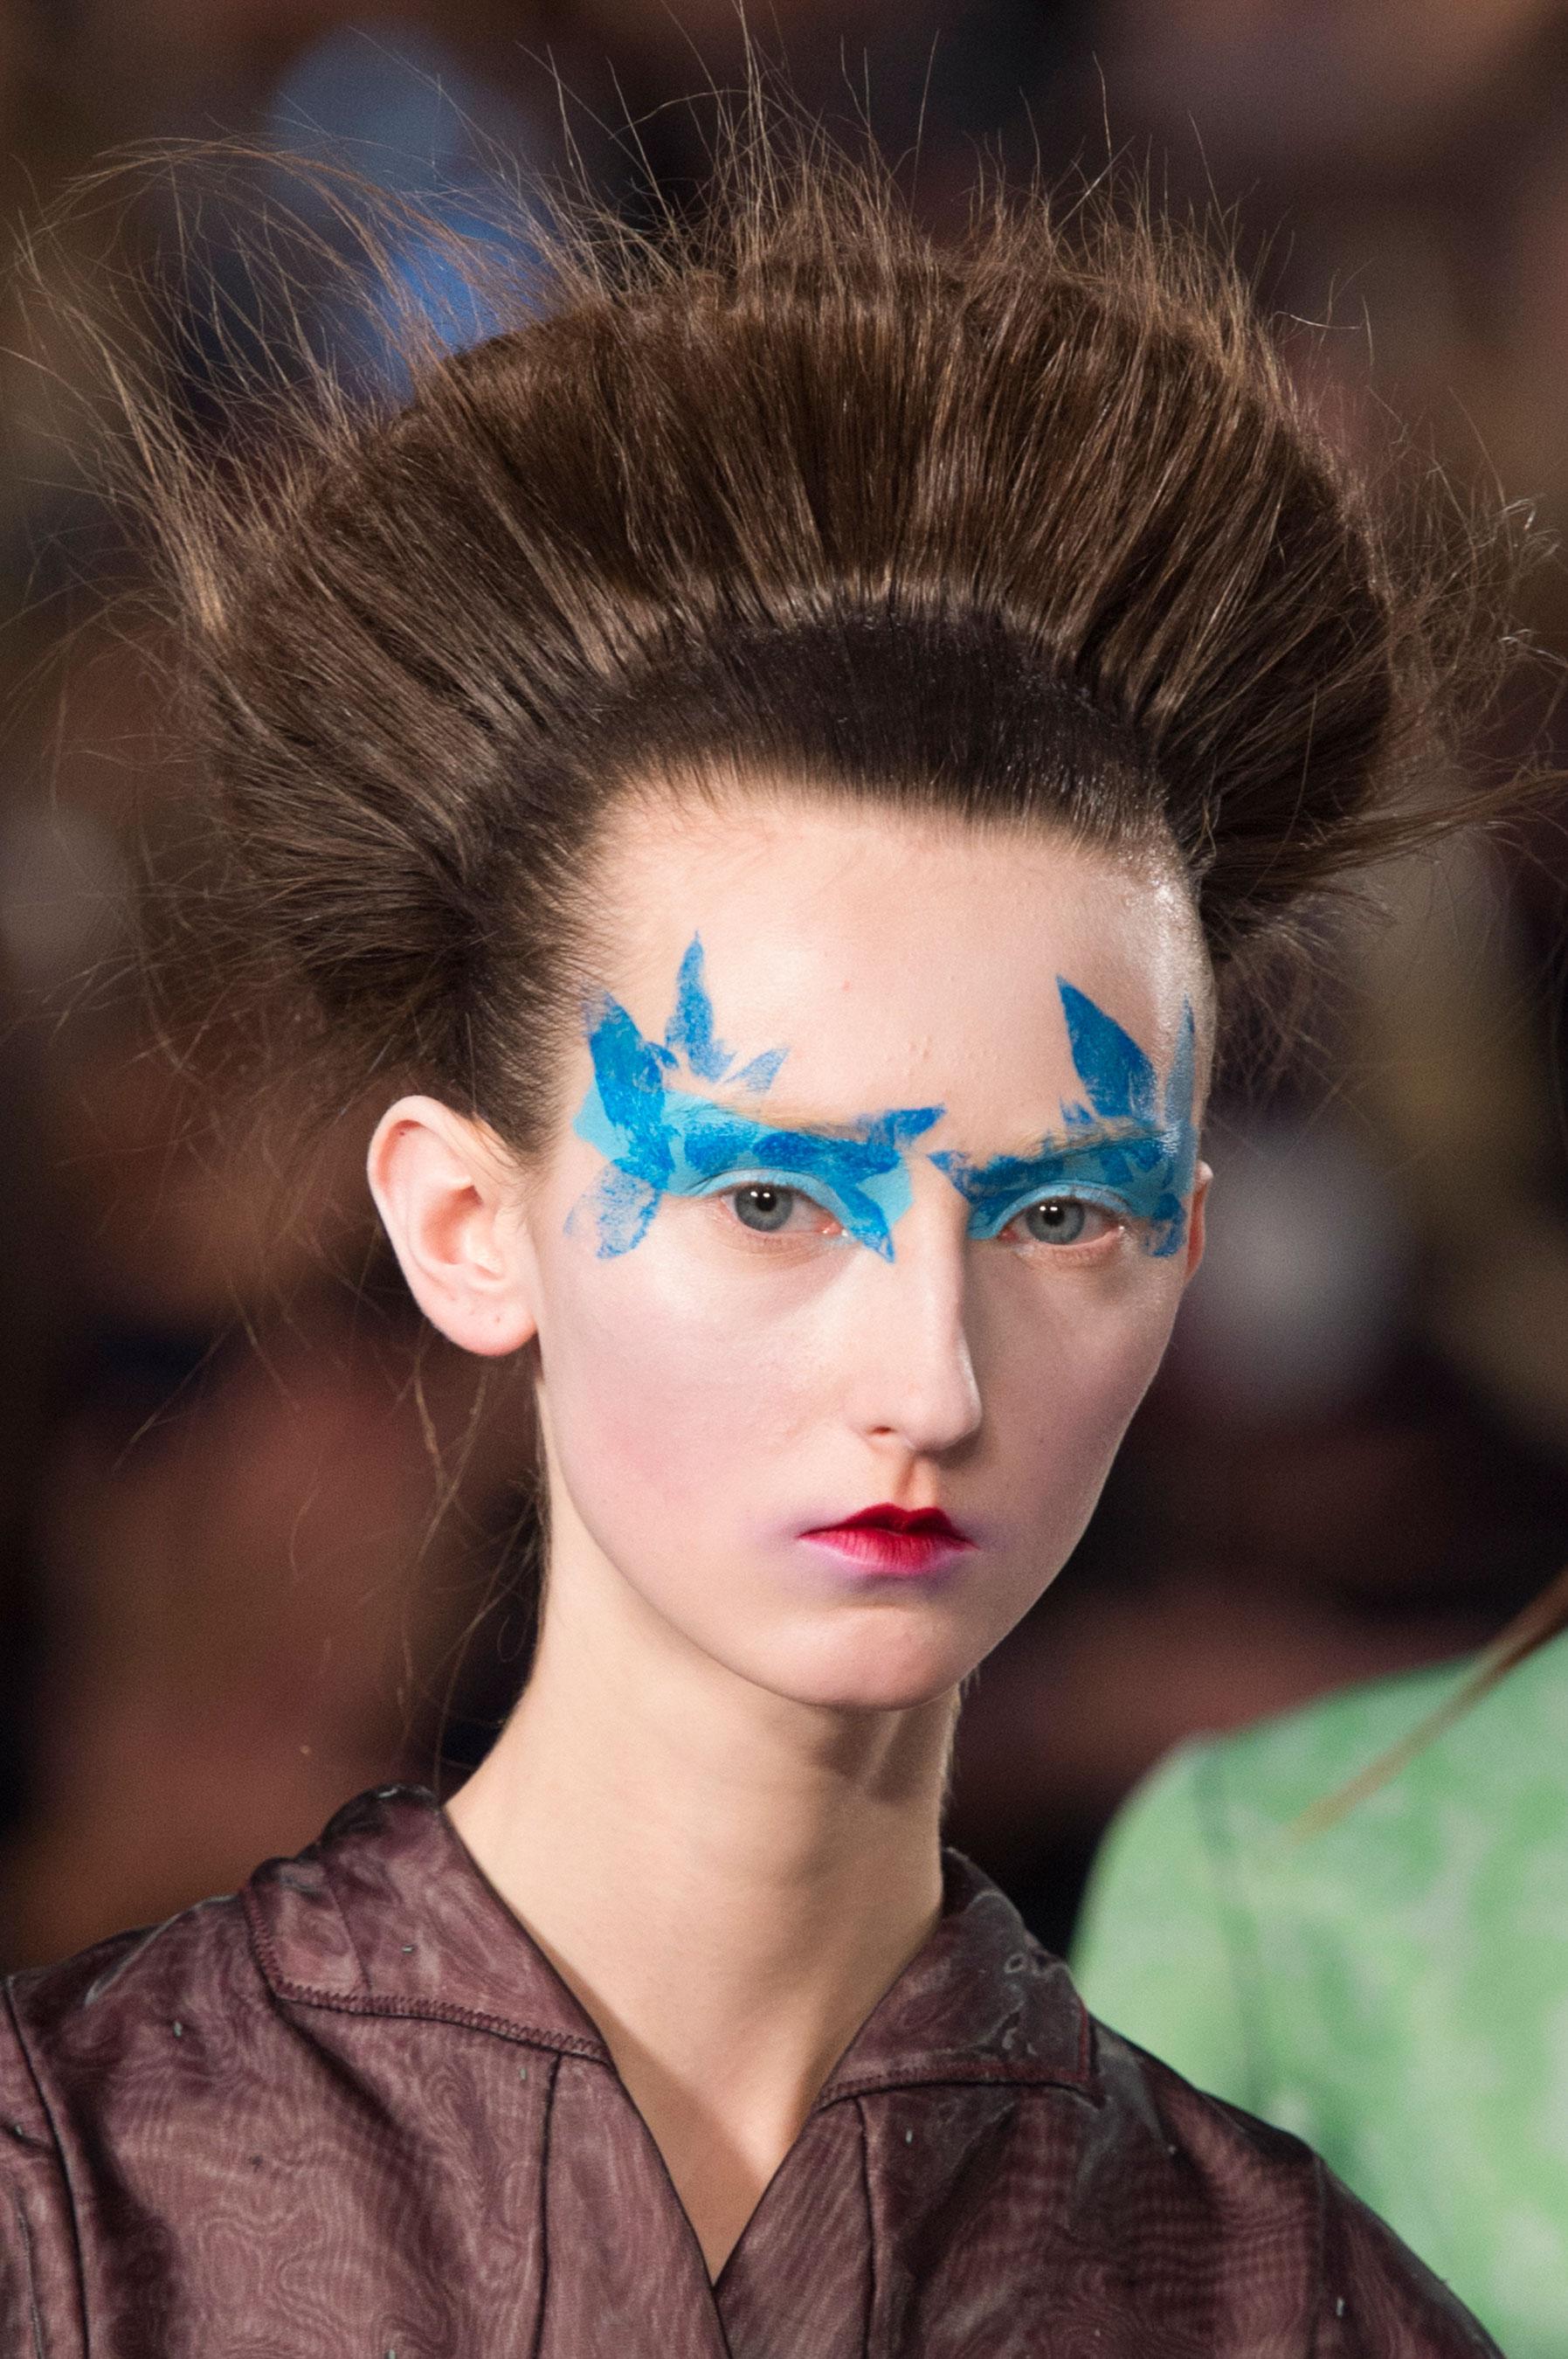 Maison-Margiela-spring-2016-runway-beauty-fashion-show-the-impression-082